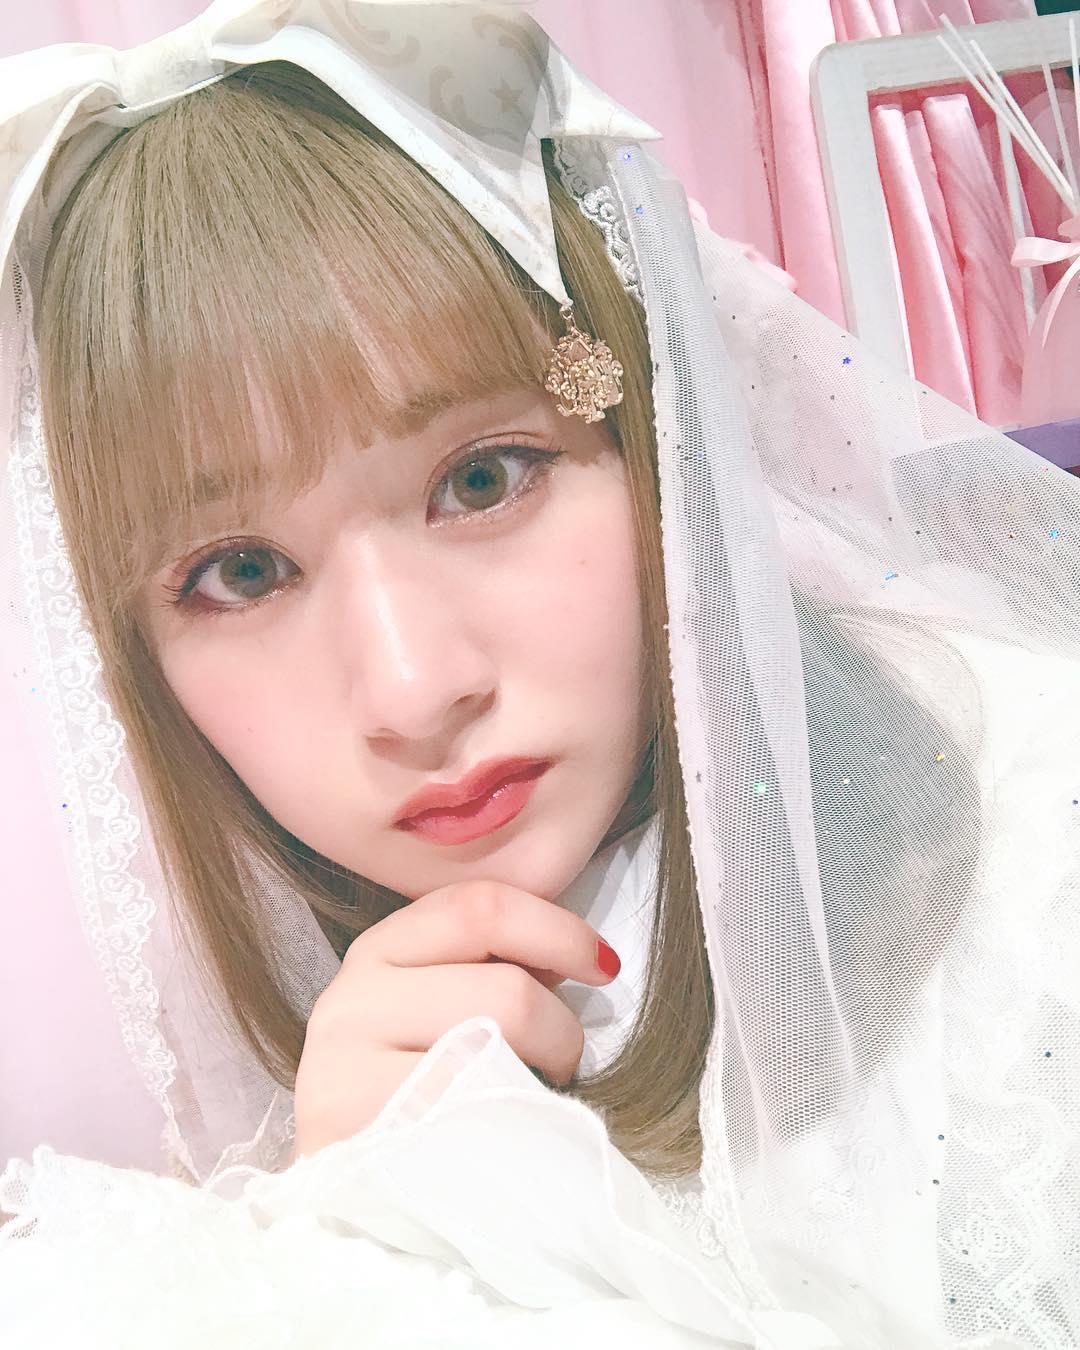 NGT48・加藤美南&中井りかが大変身! 金髪かとみな&「みるきーぐれー ...